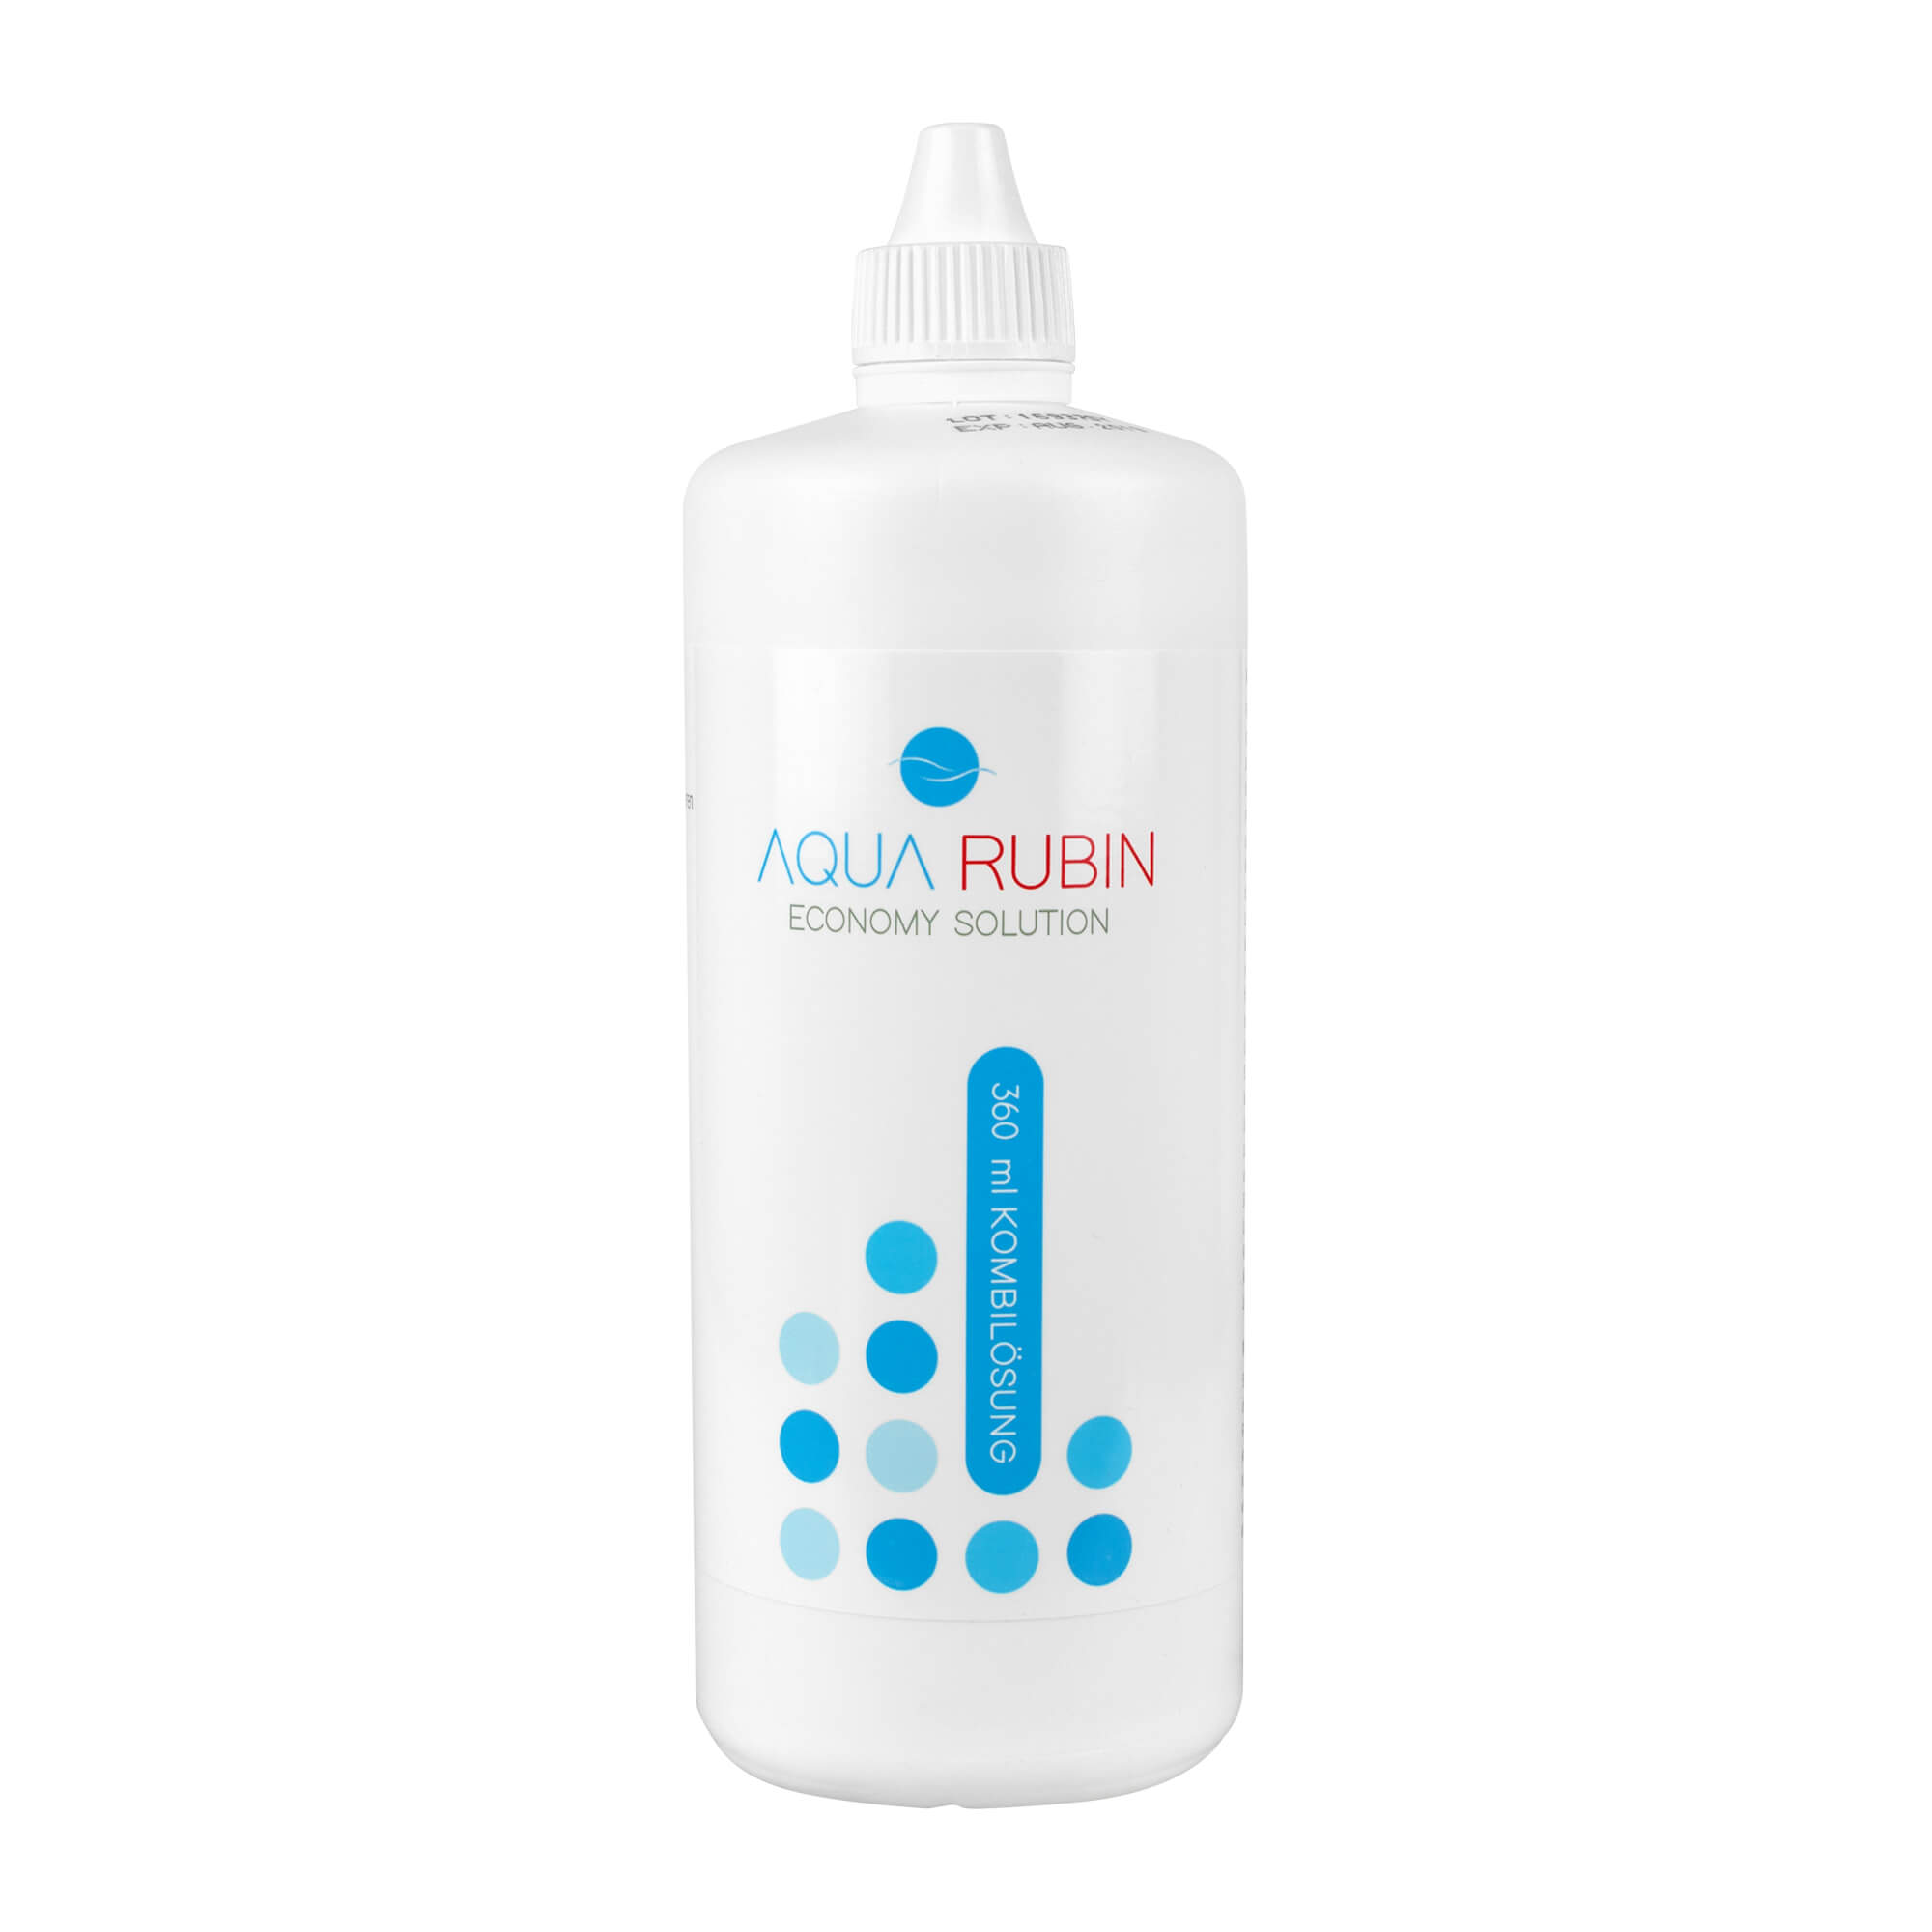 Aqua Rubin Kombilösung